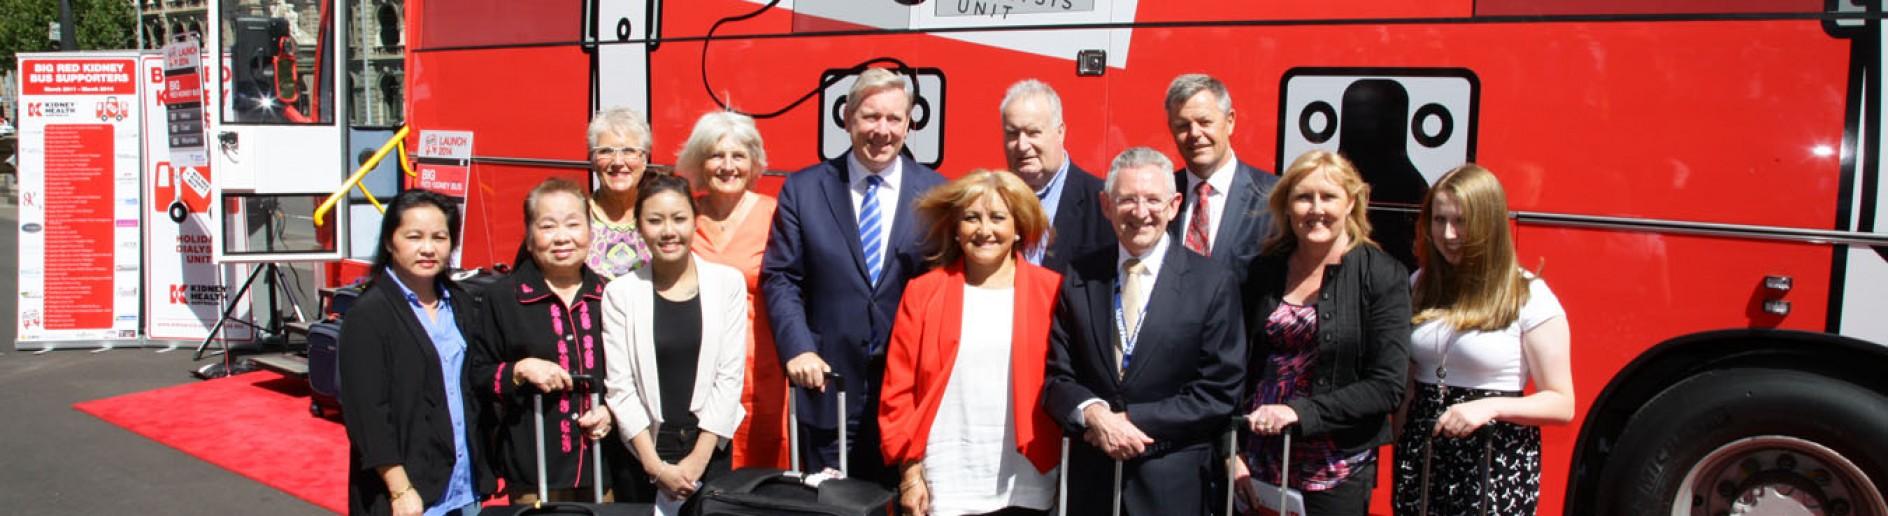 Australia 2014: Big Kidney Red Bus